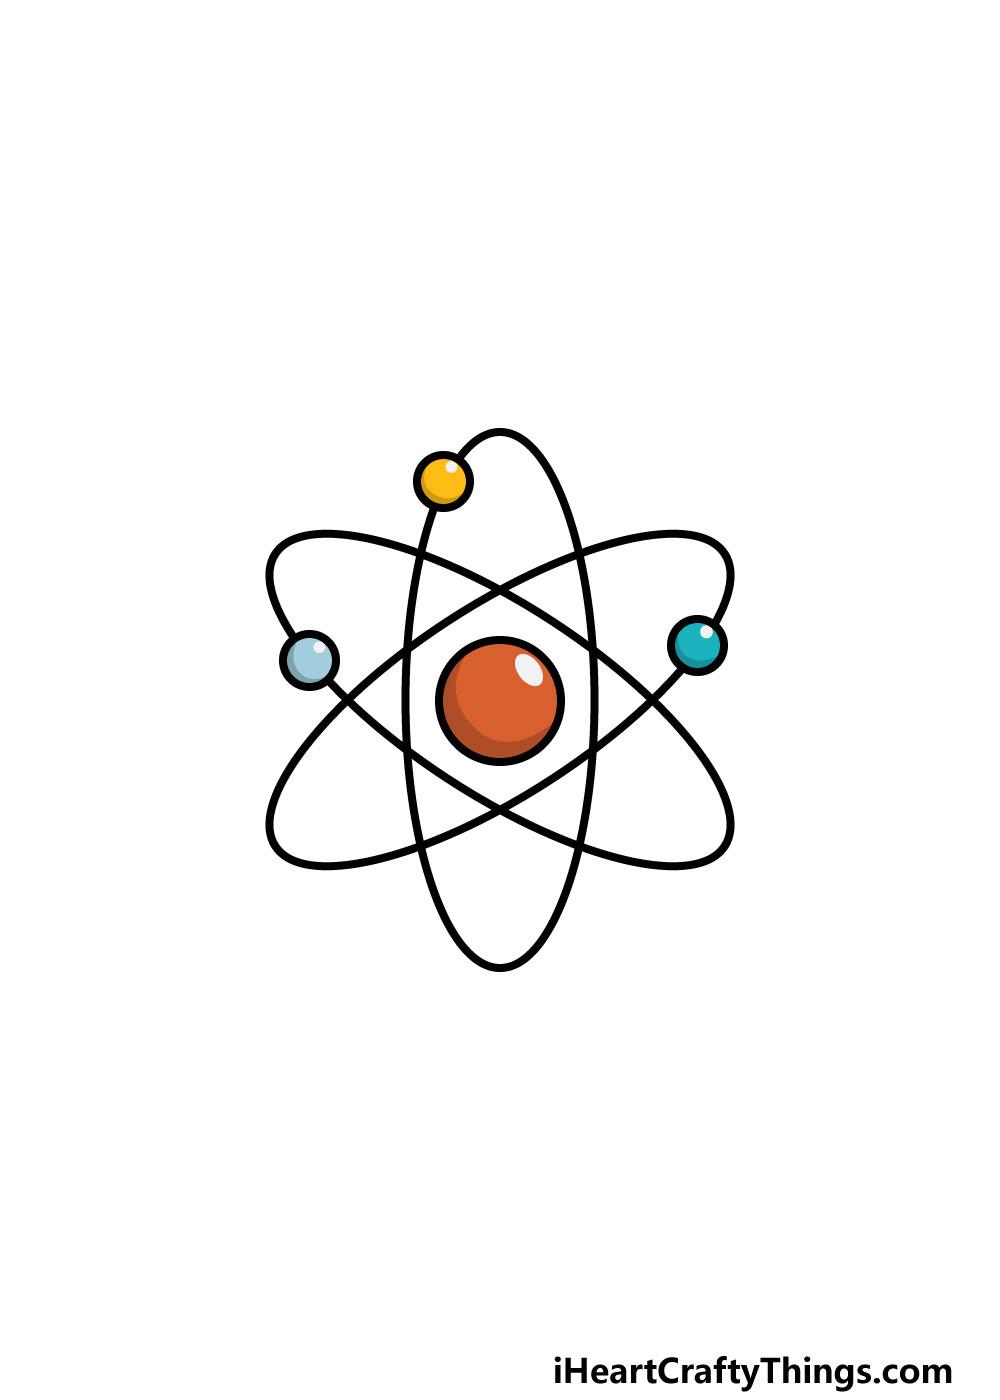 drawing an atom step 6